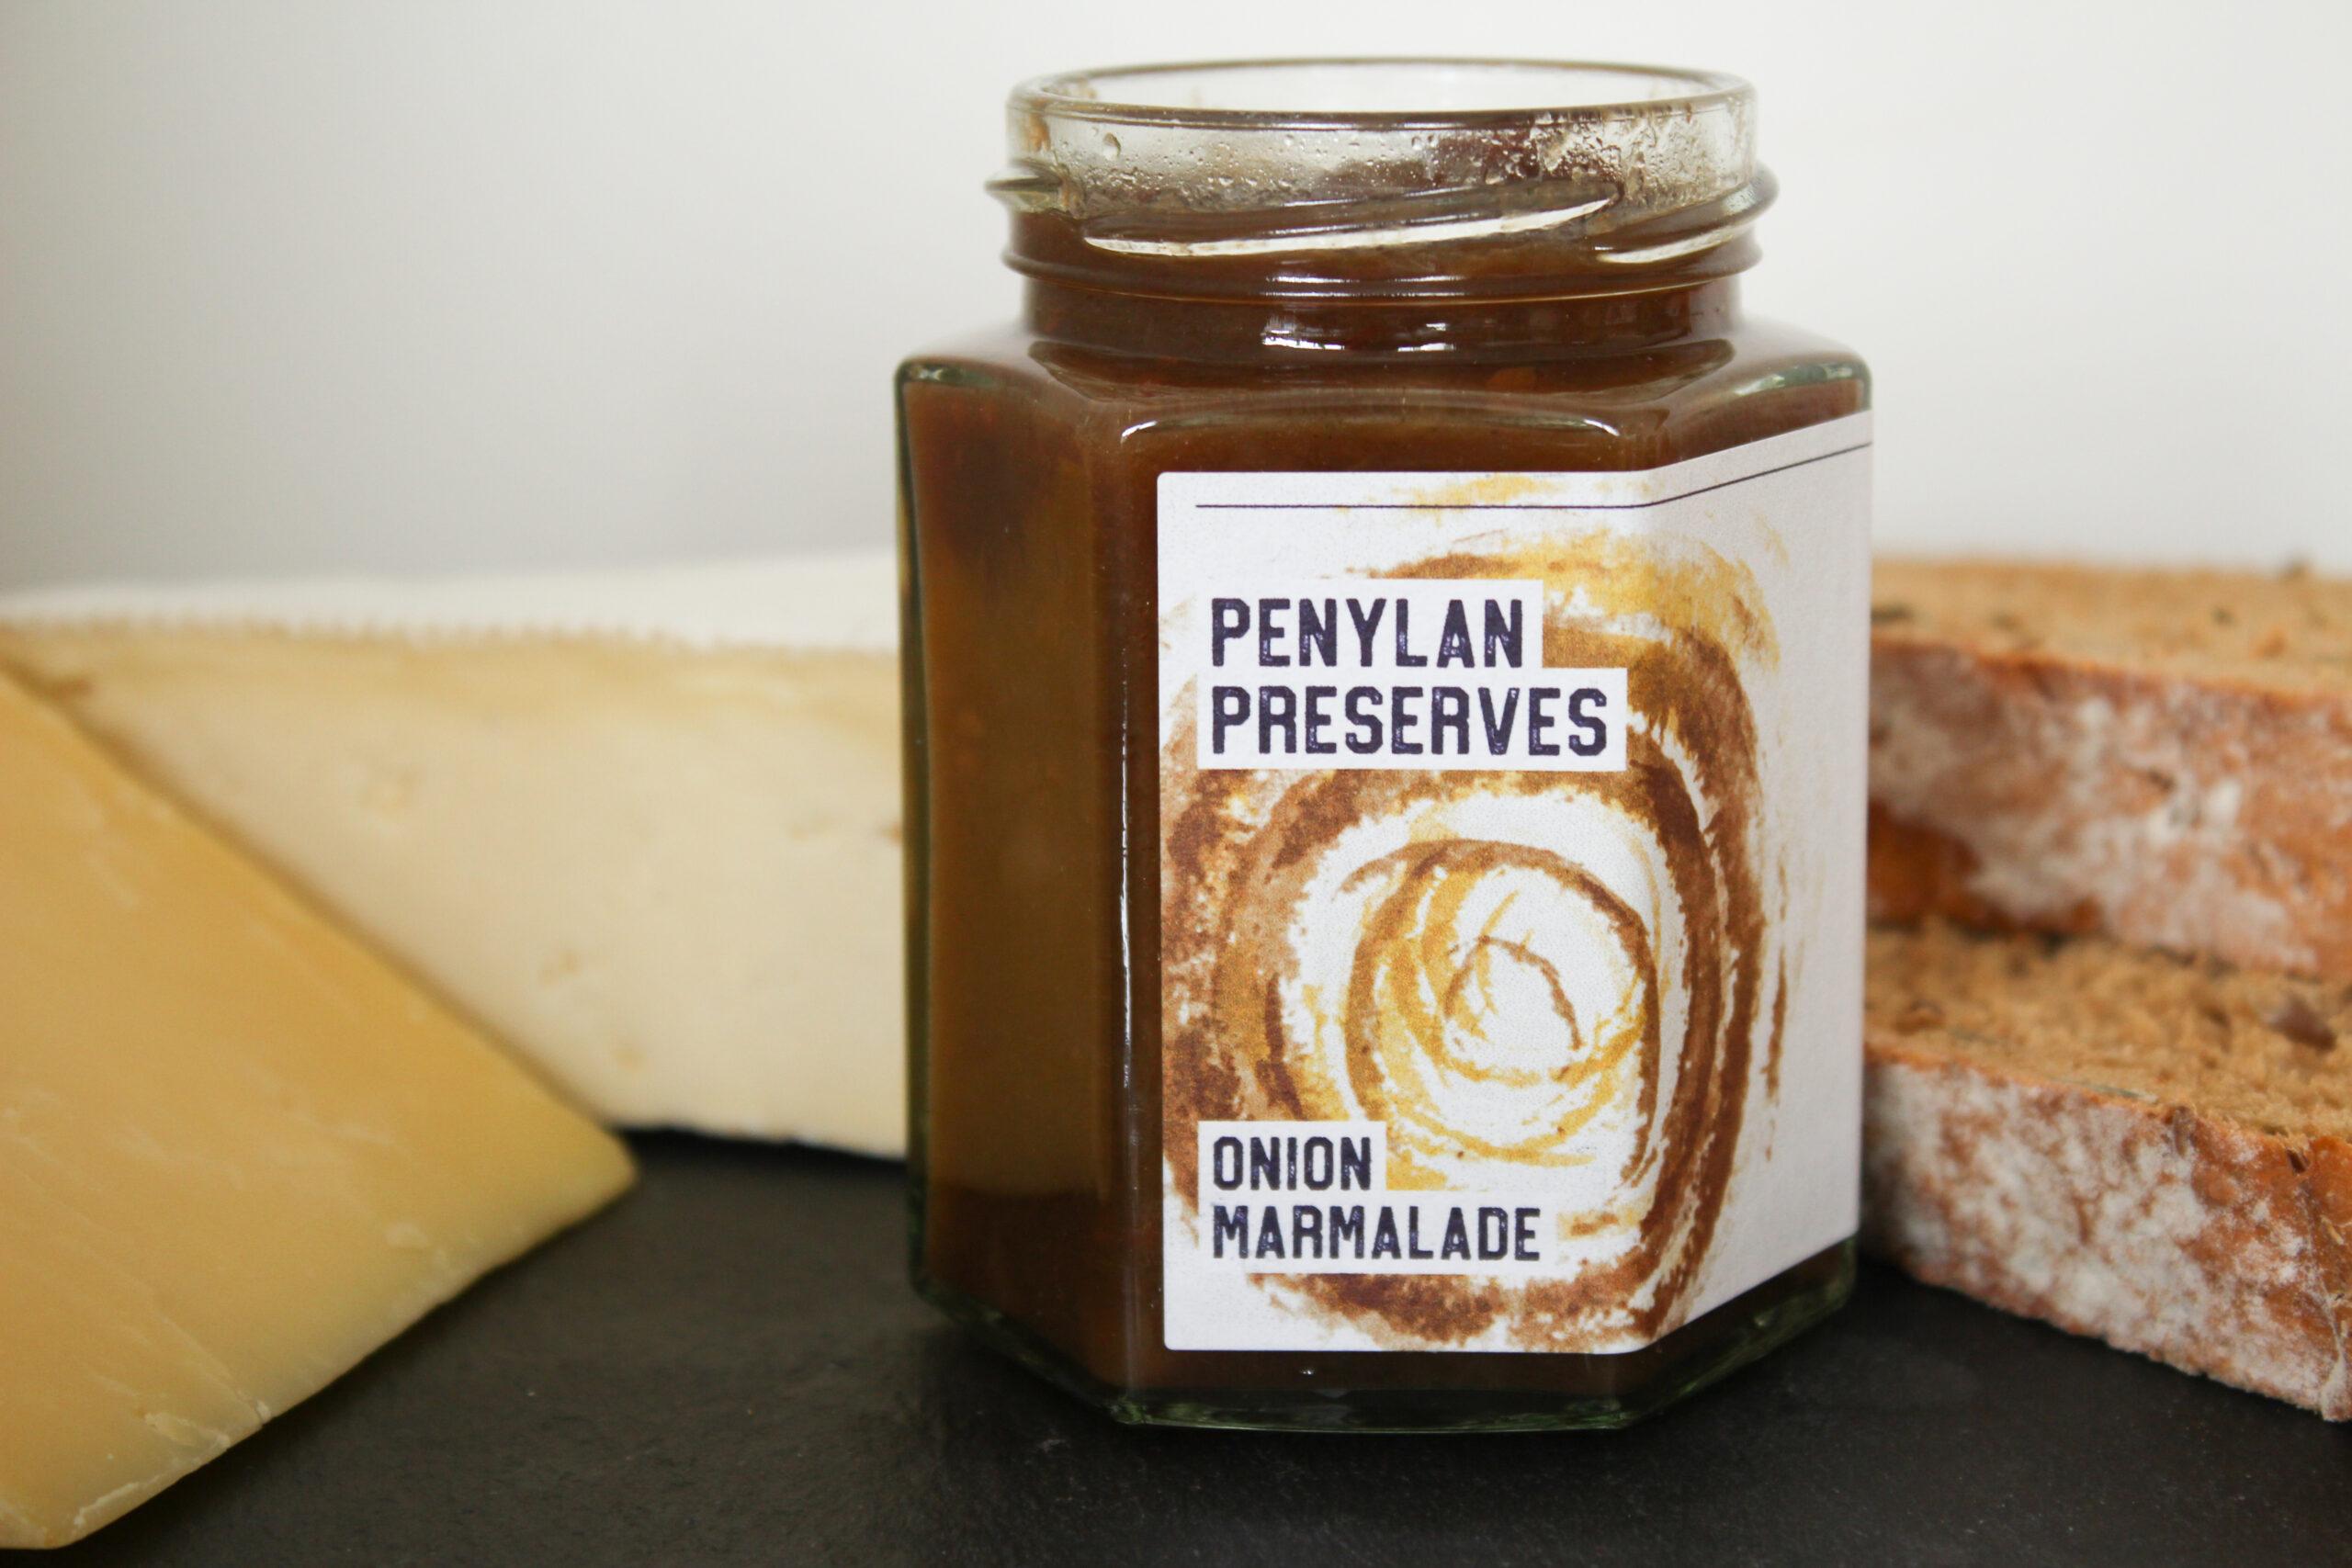 Penylan Preserves